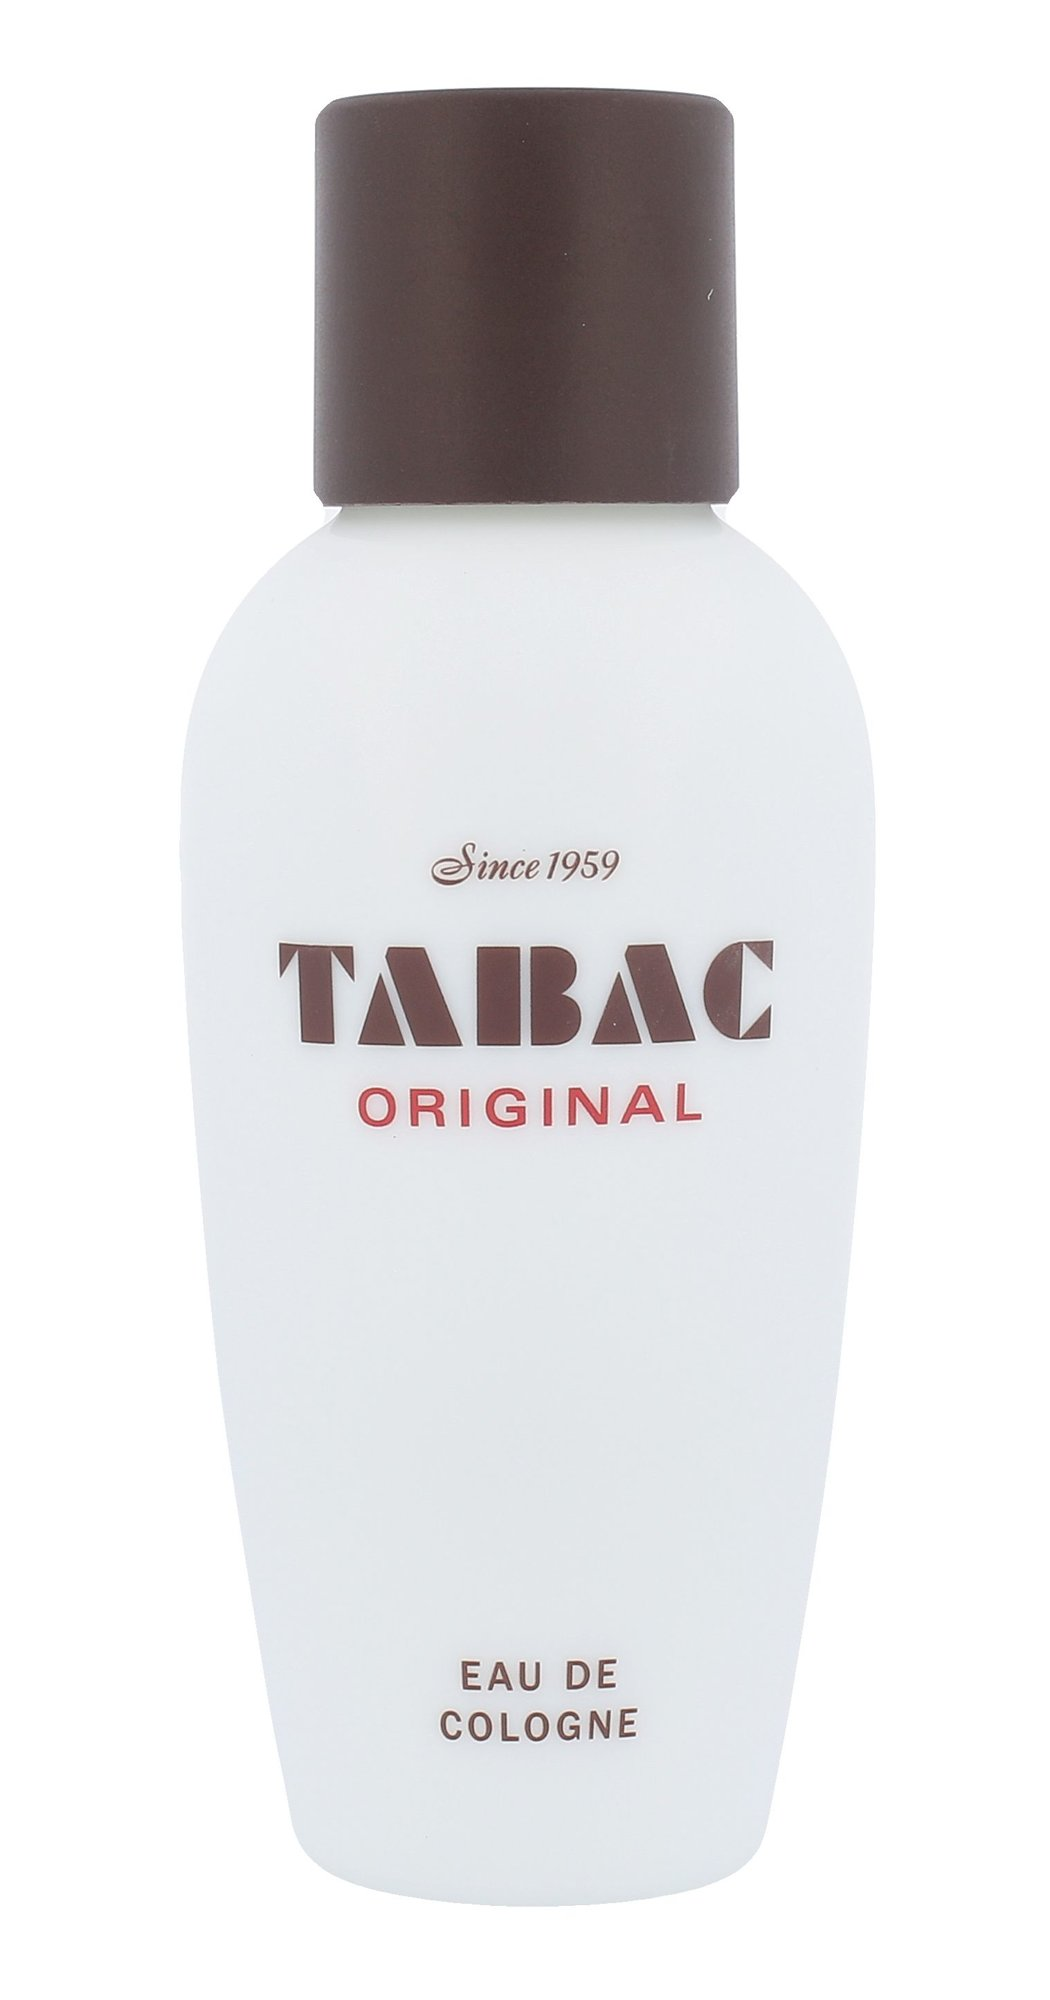 Tabac Original Cologne 150ml